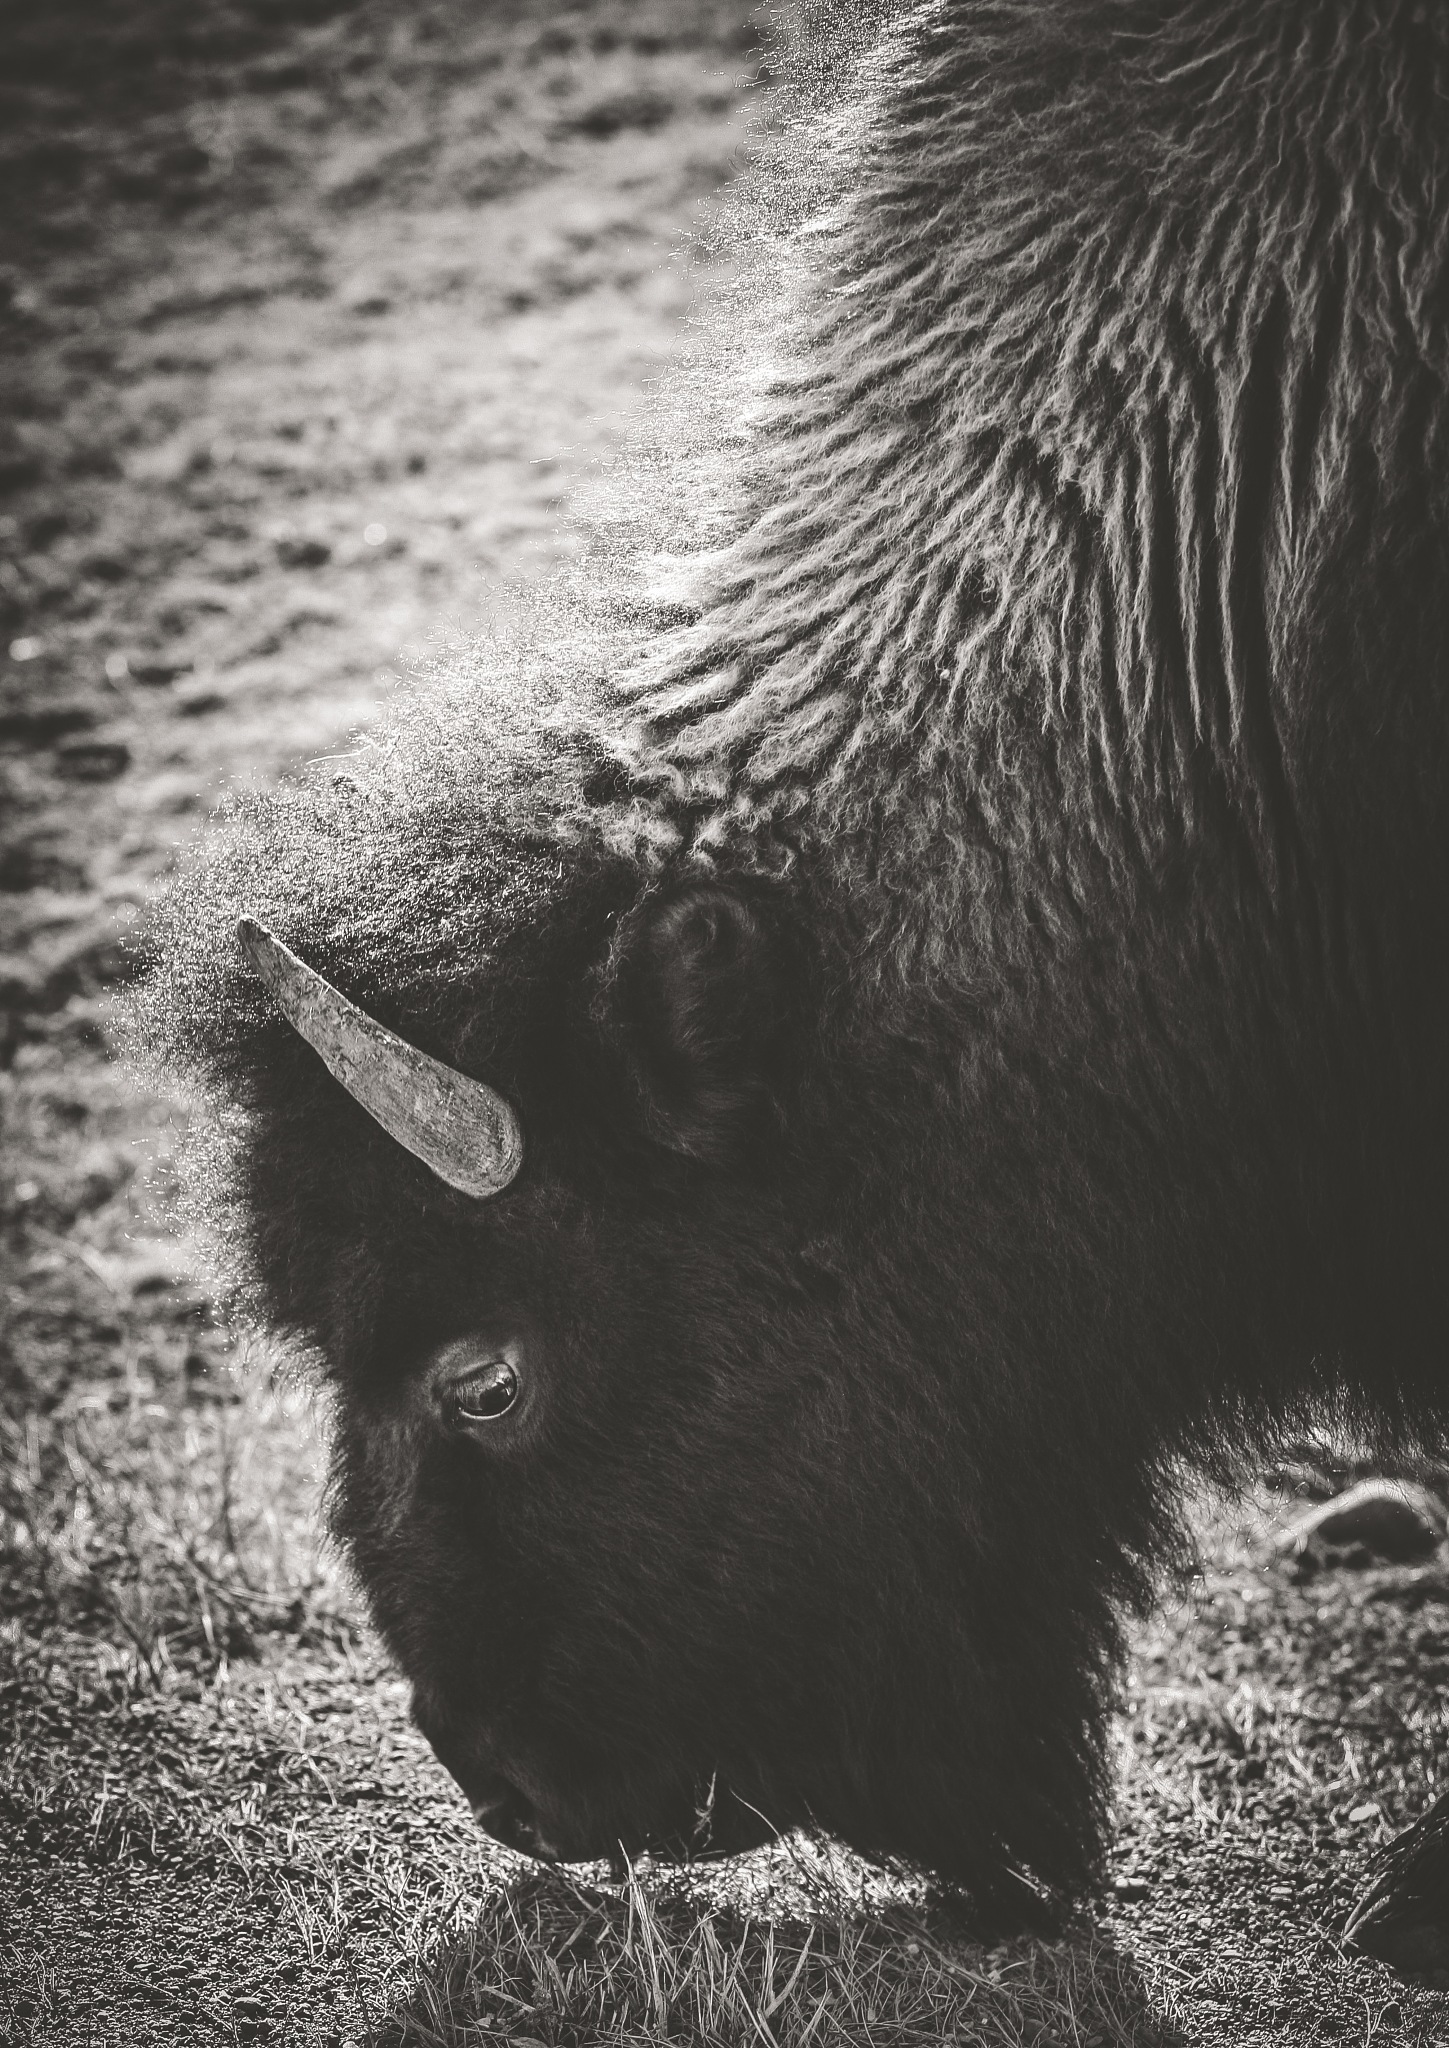 Buffalo by Christine Bakke